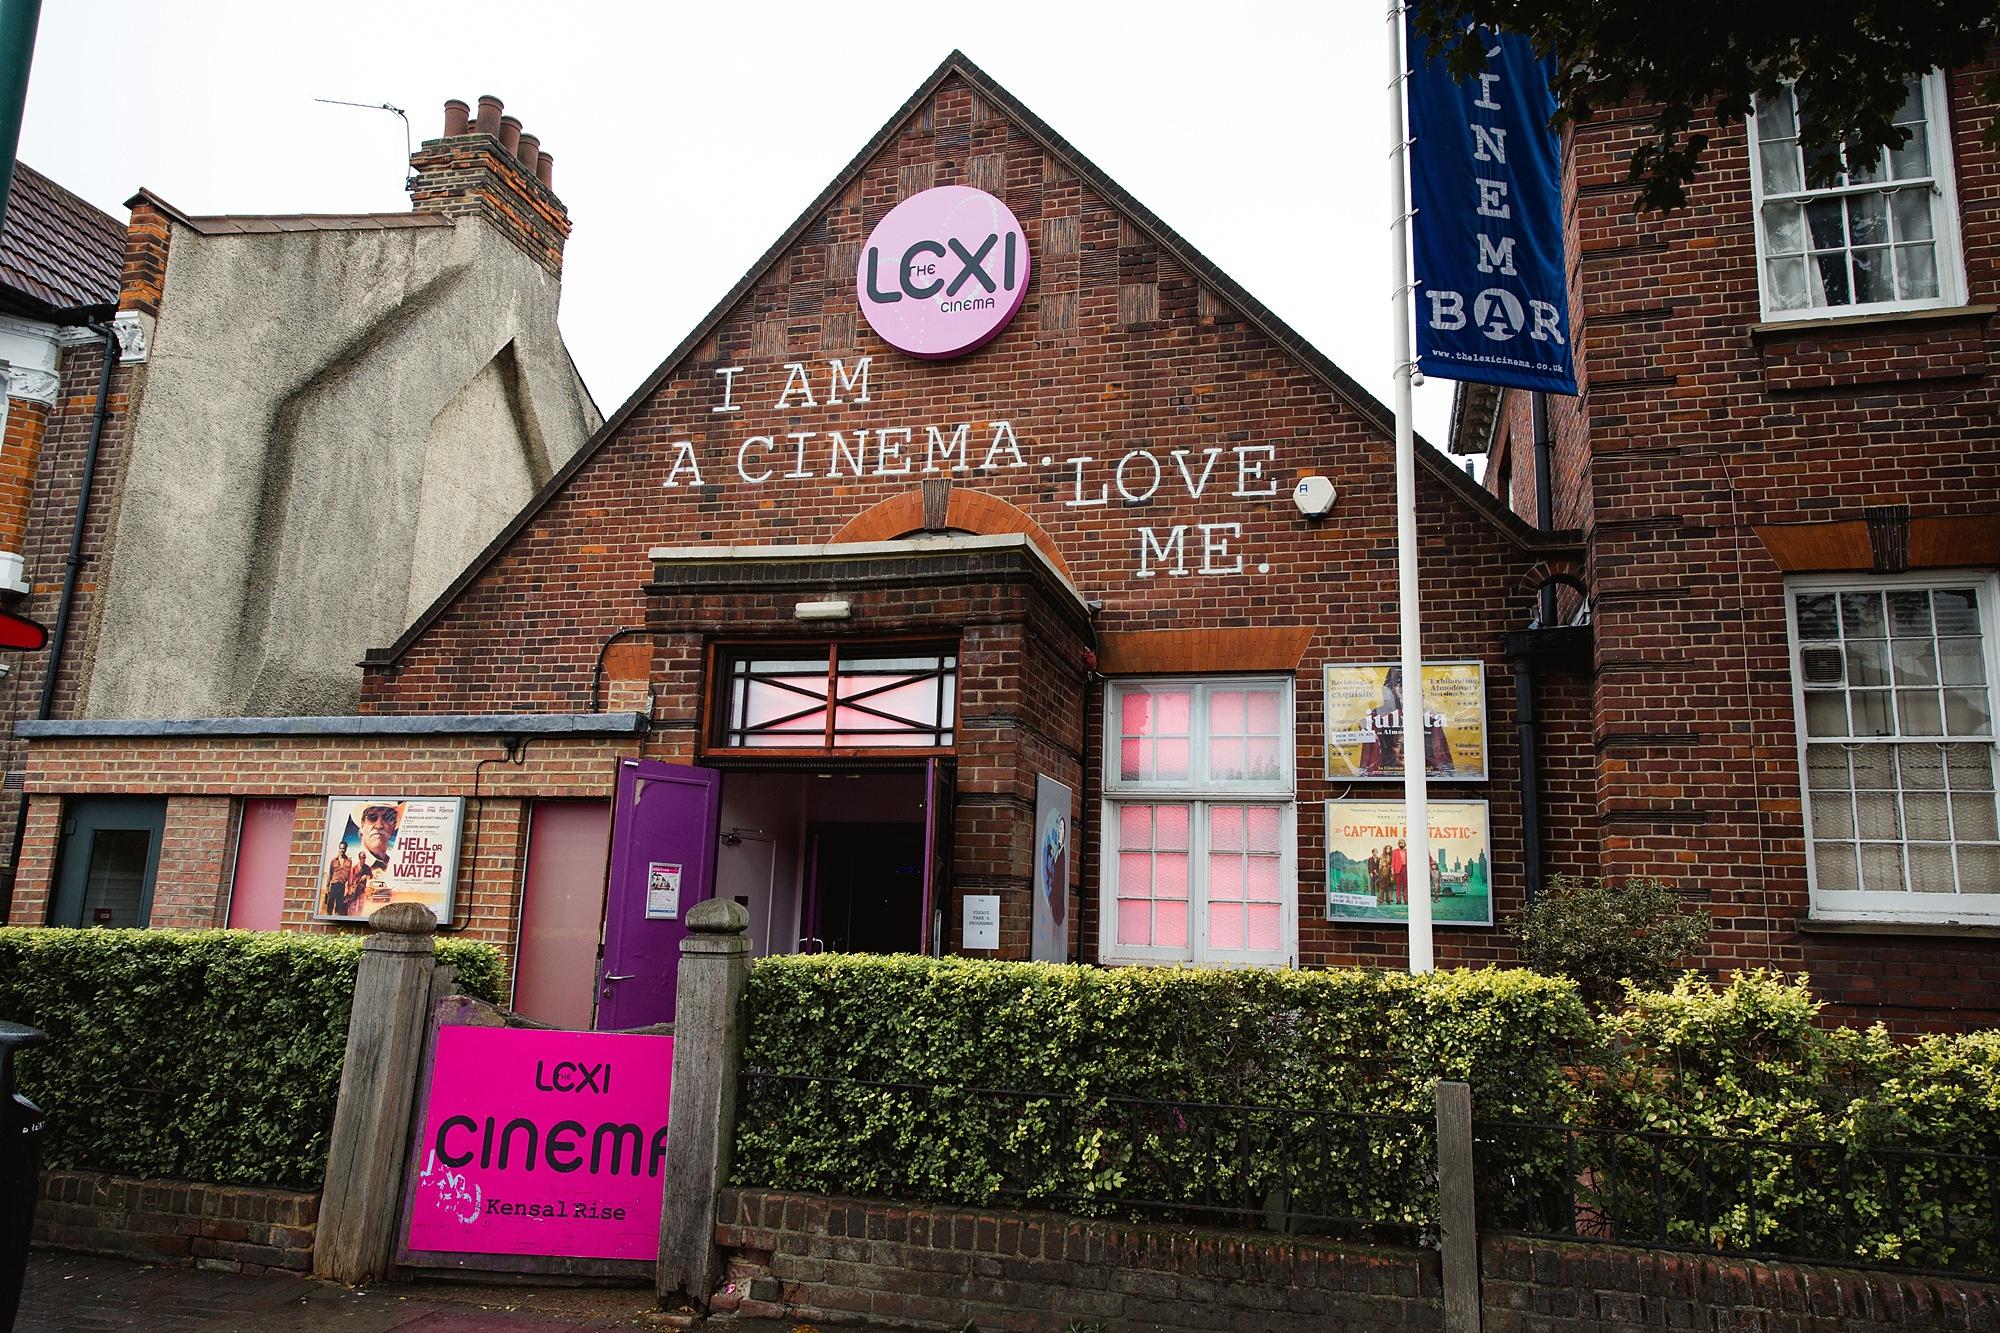 Paradise by way of Kensal Green wedding the Lexi cinema